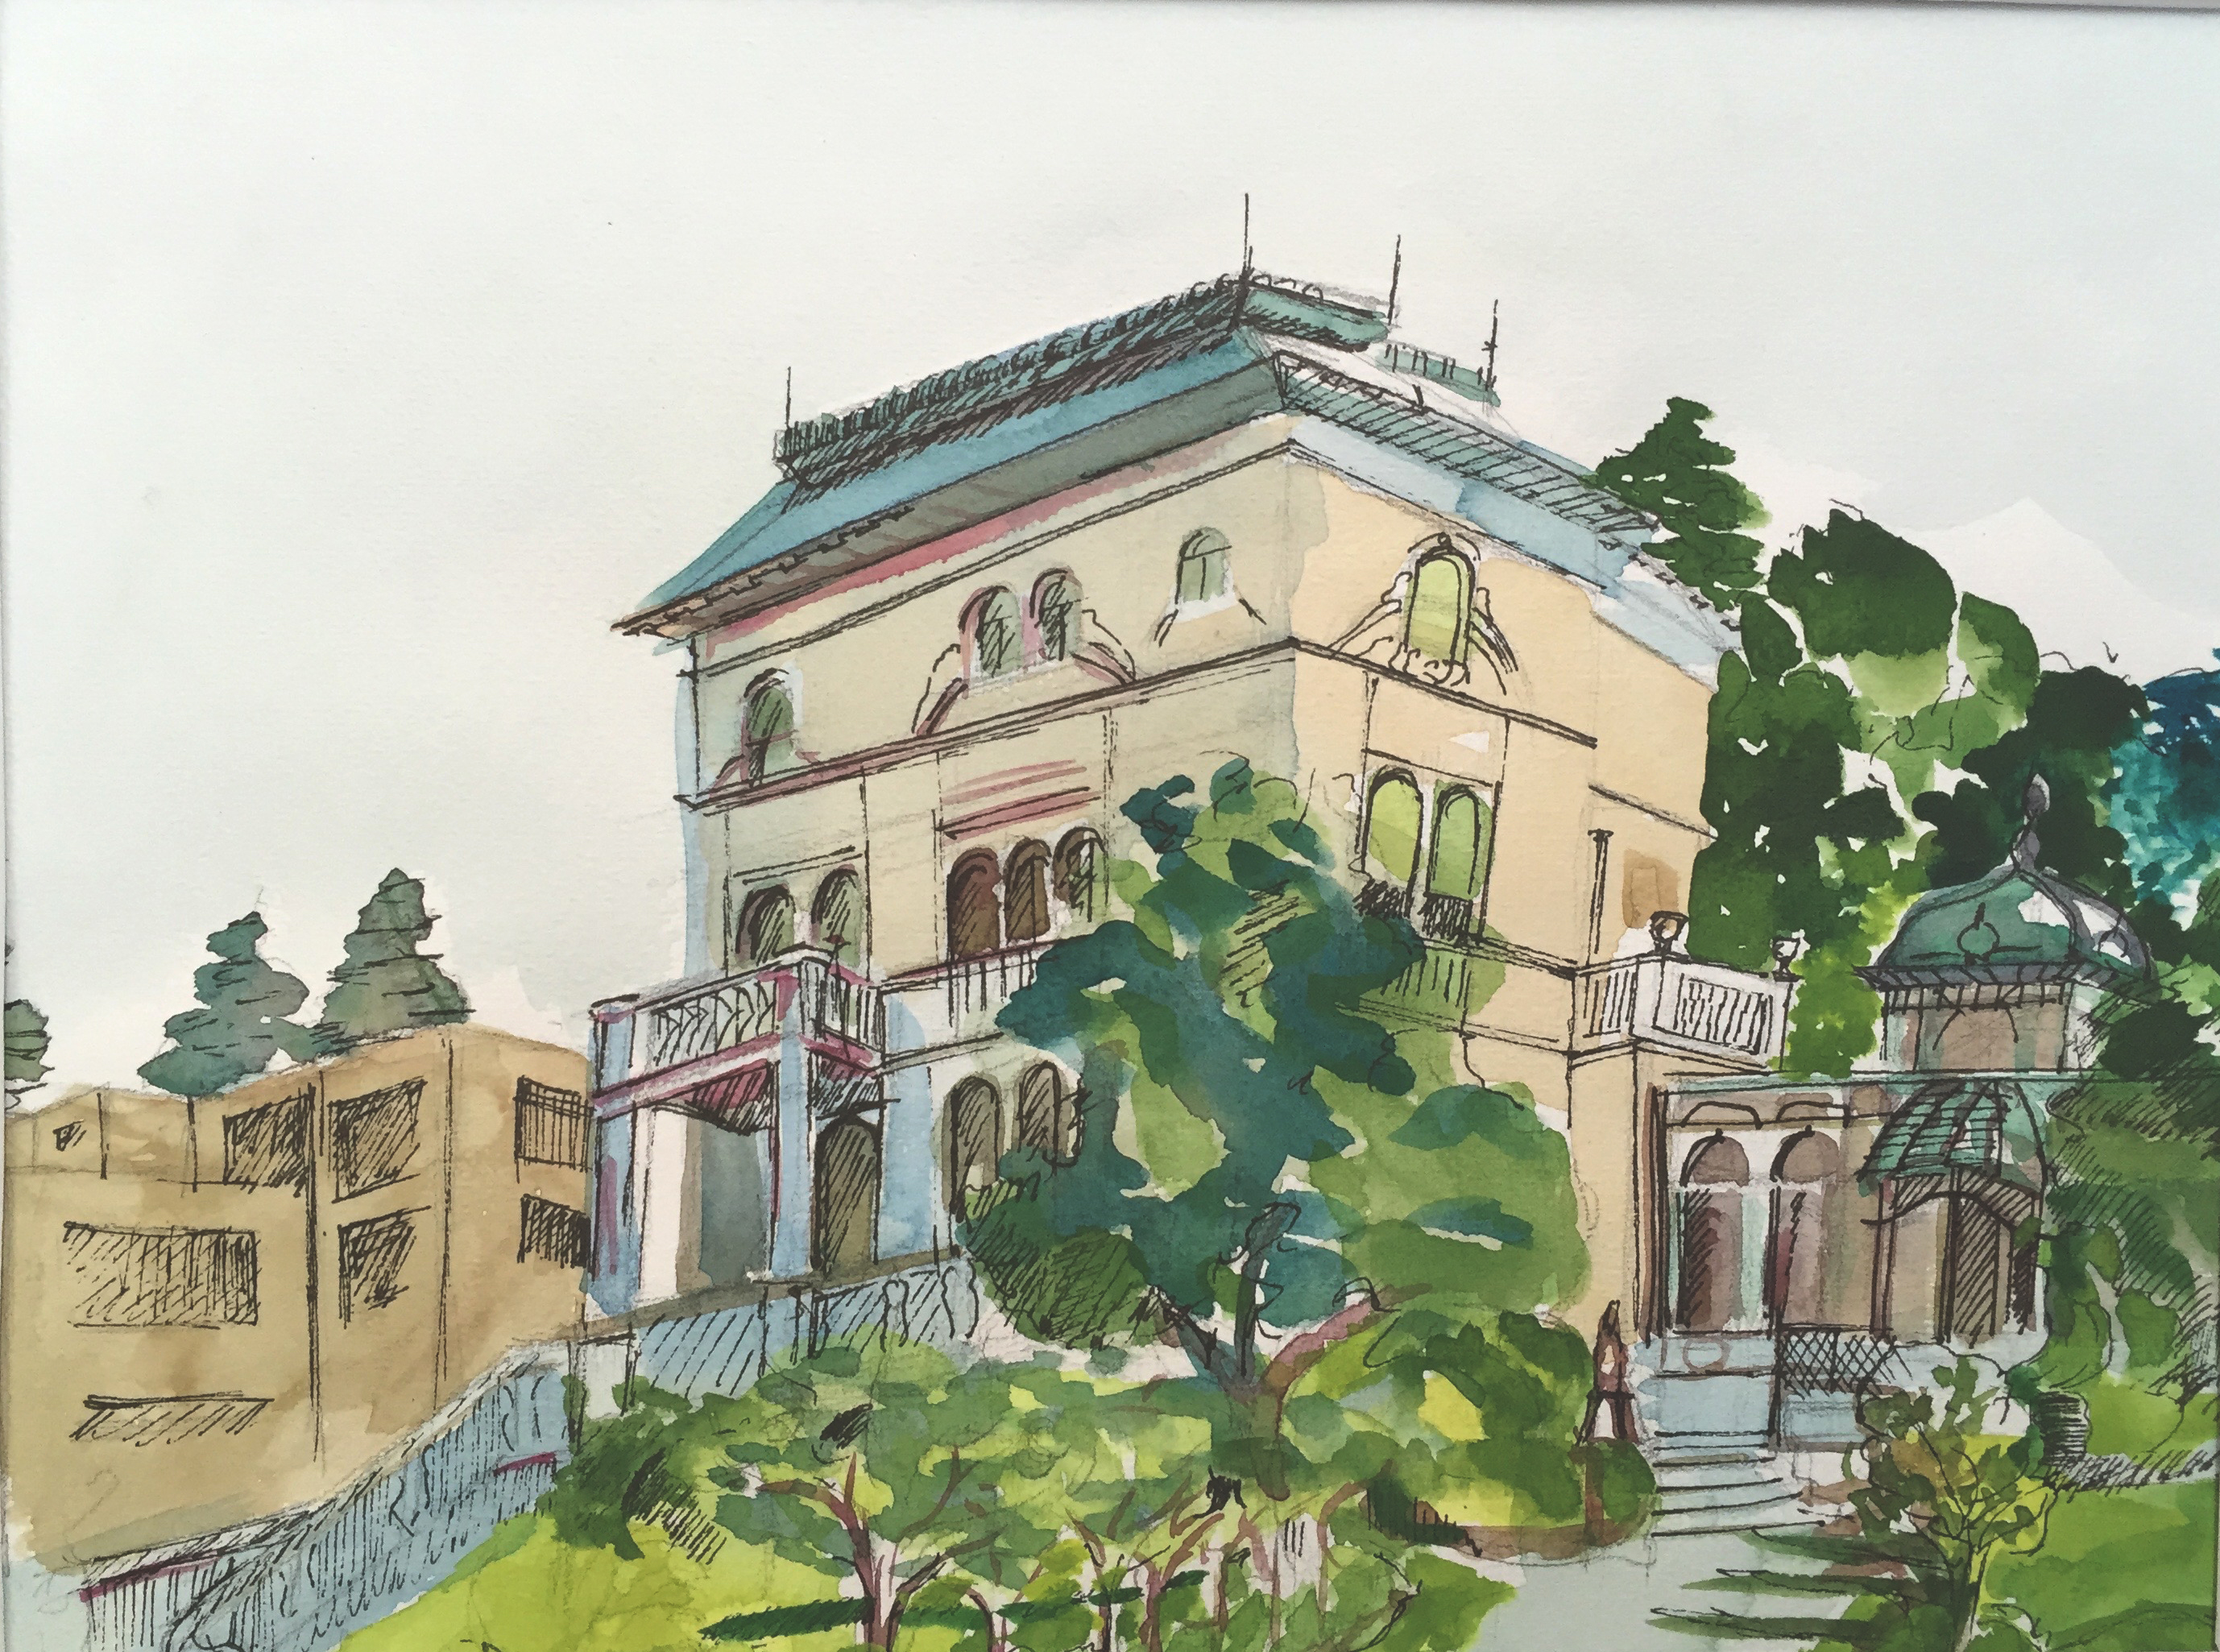 Villa Pathumba, Zürich,Aquarell, Tusche, Astrid Amadeo, Urban Sketching